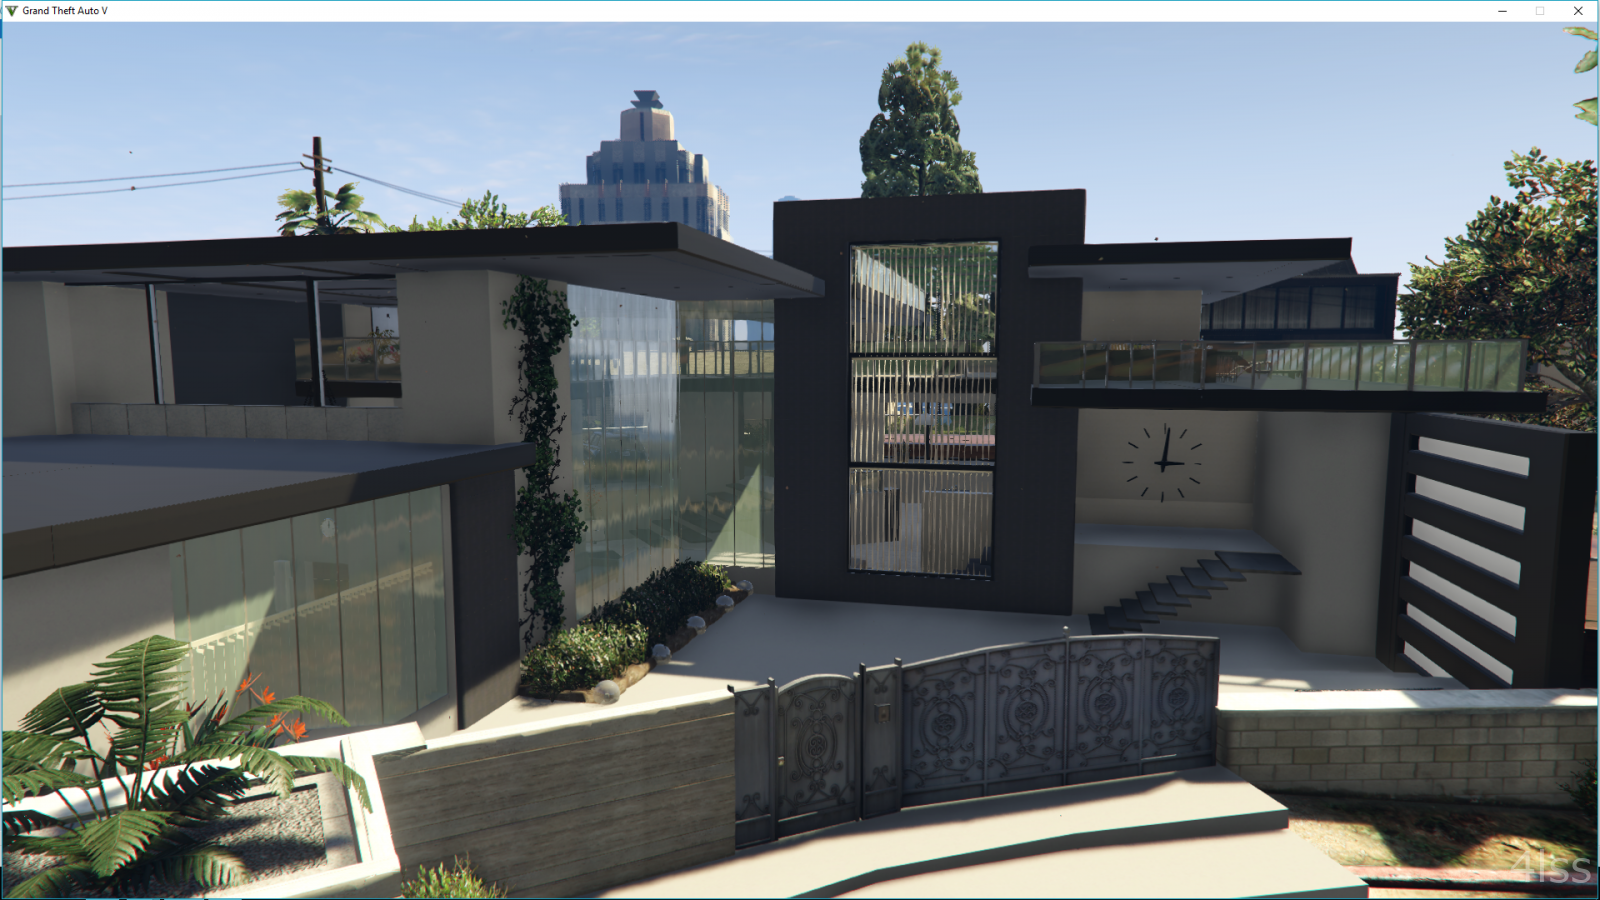 West Vinewood Modern House